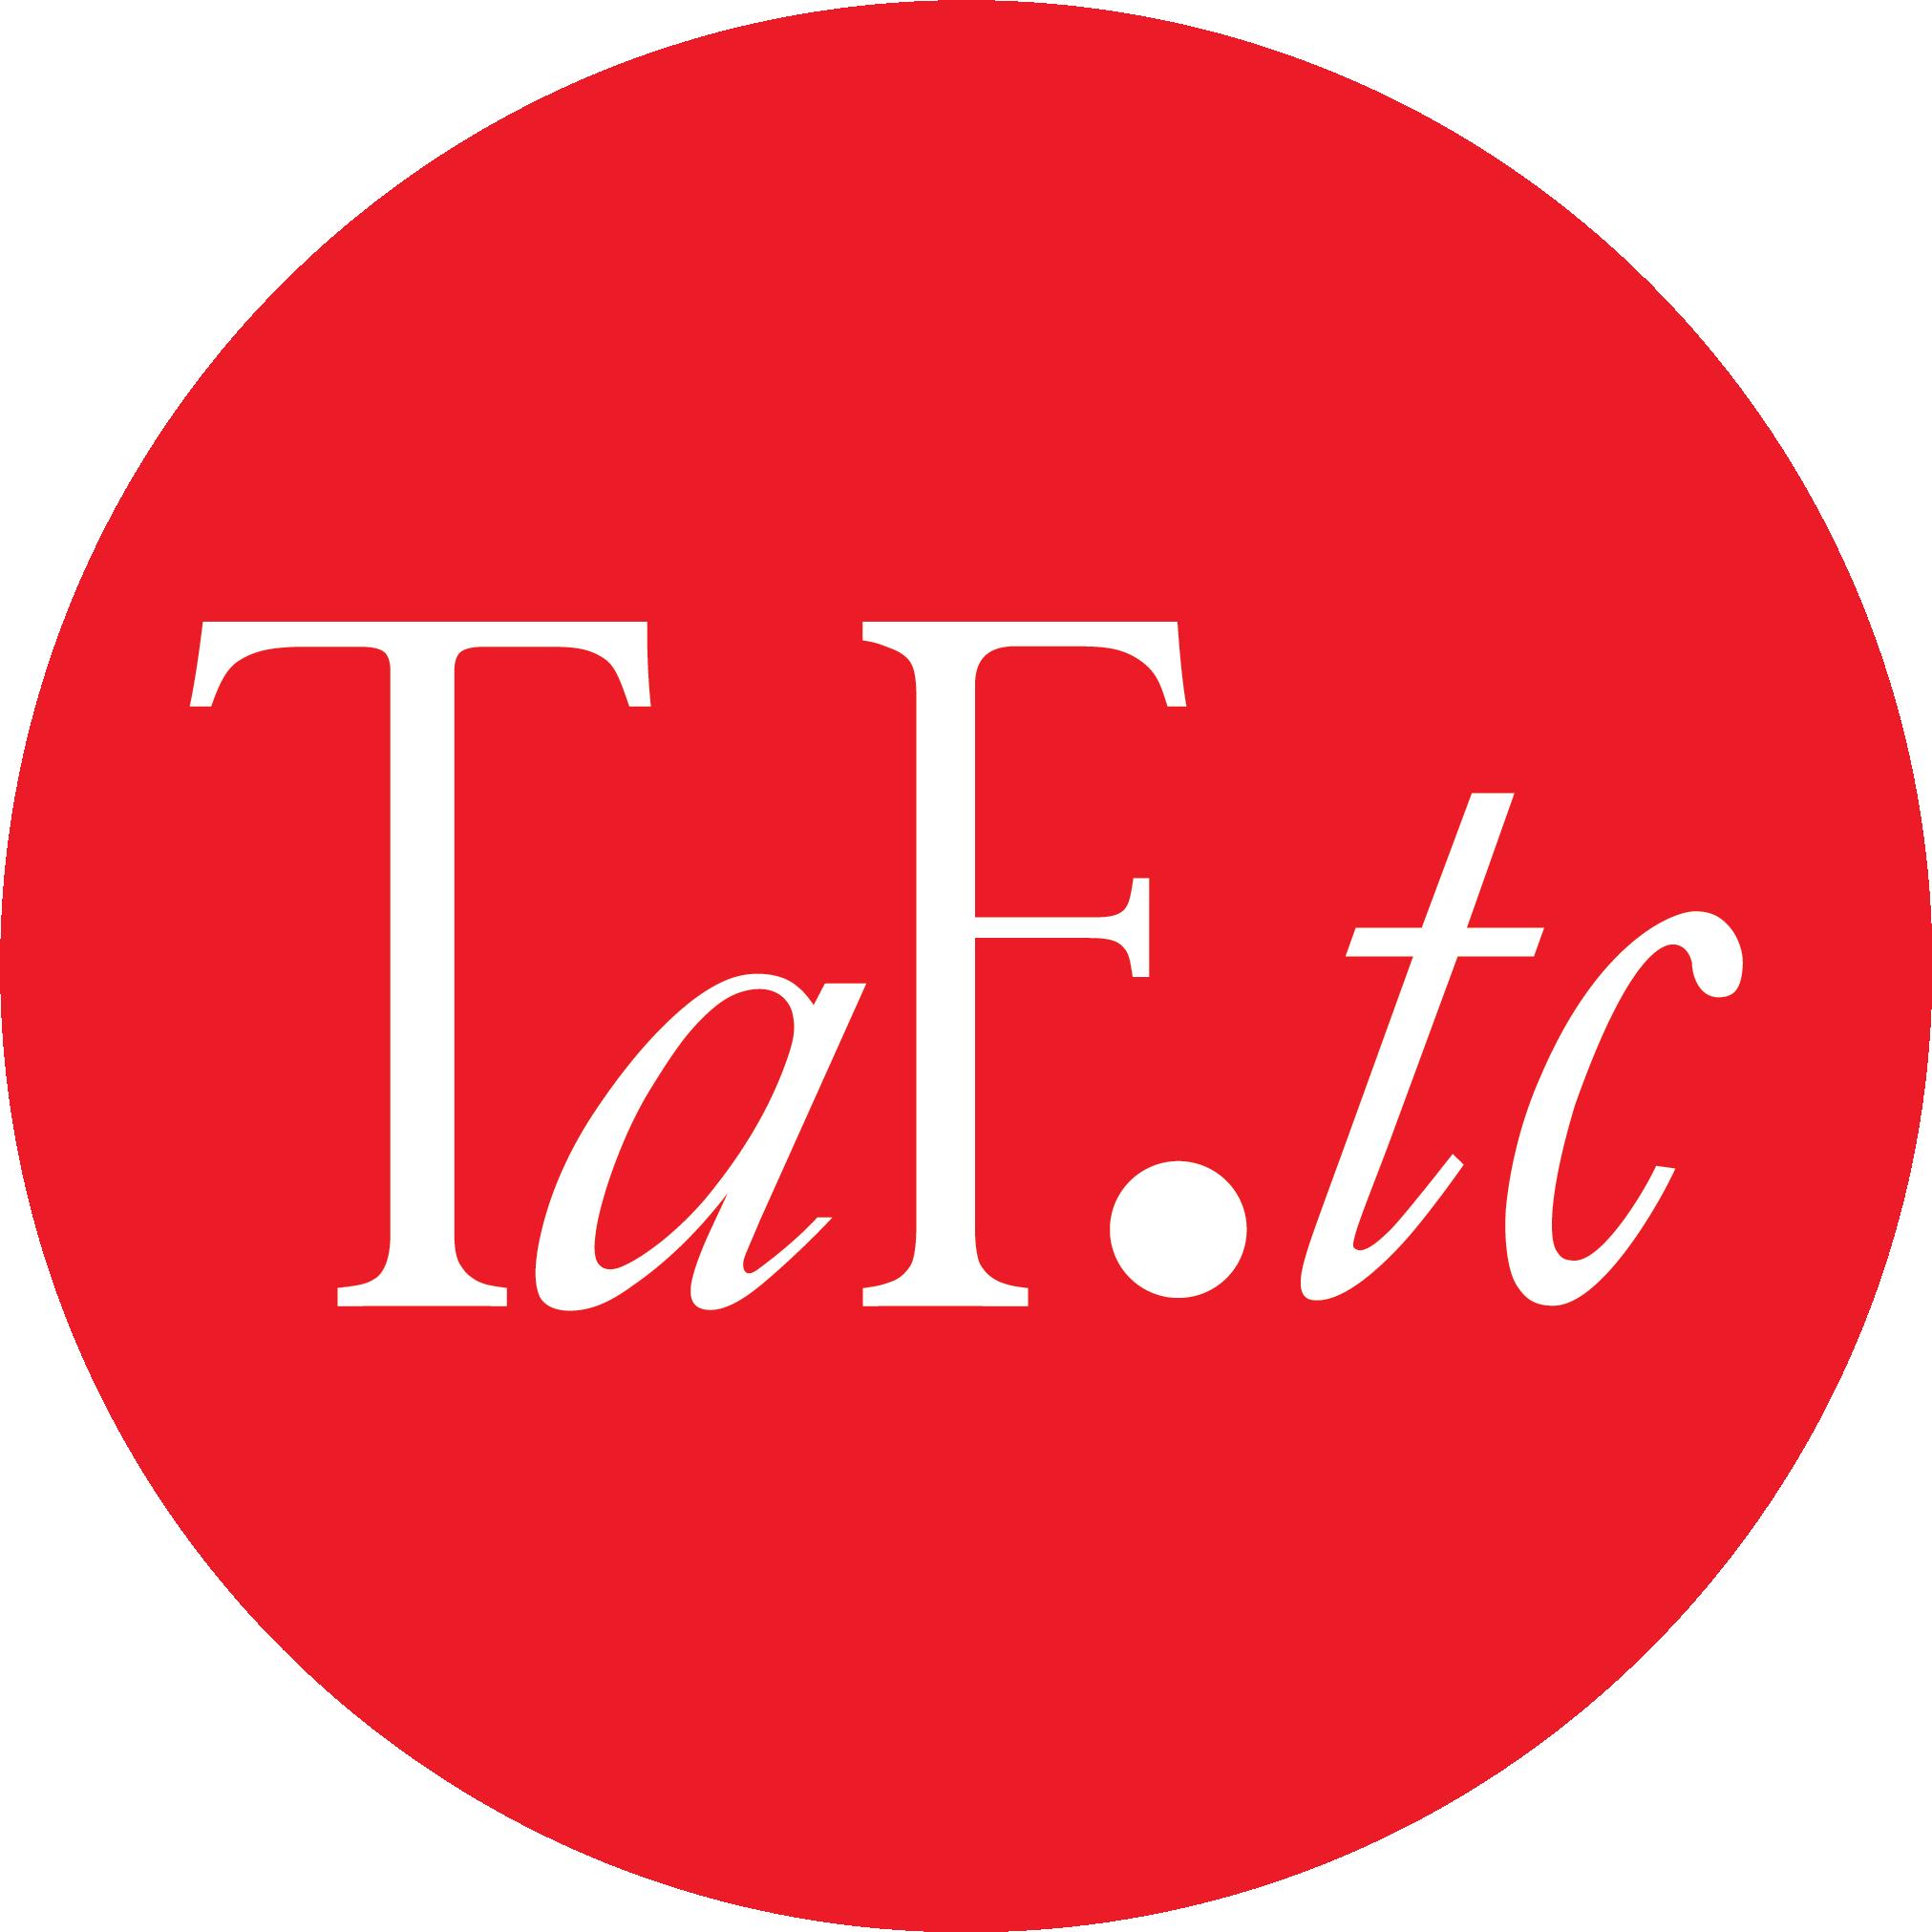 TaF.tc logo